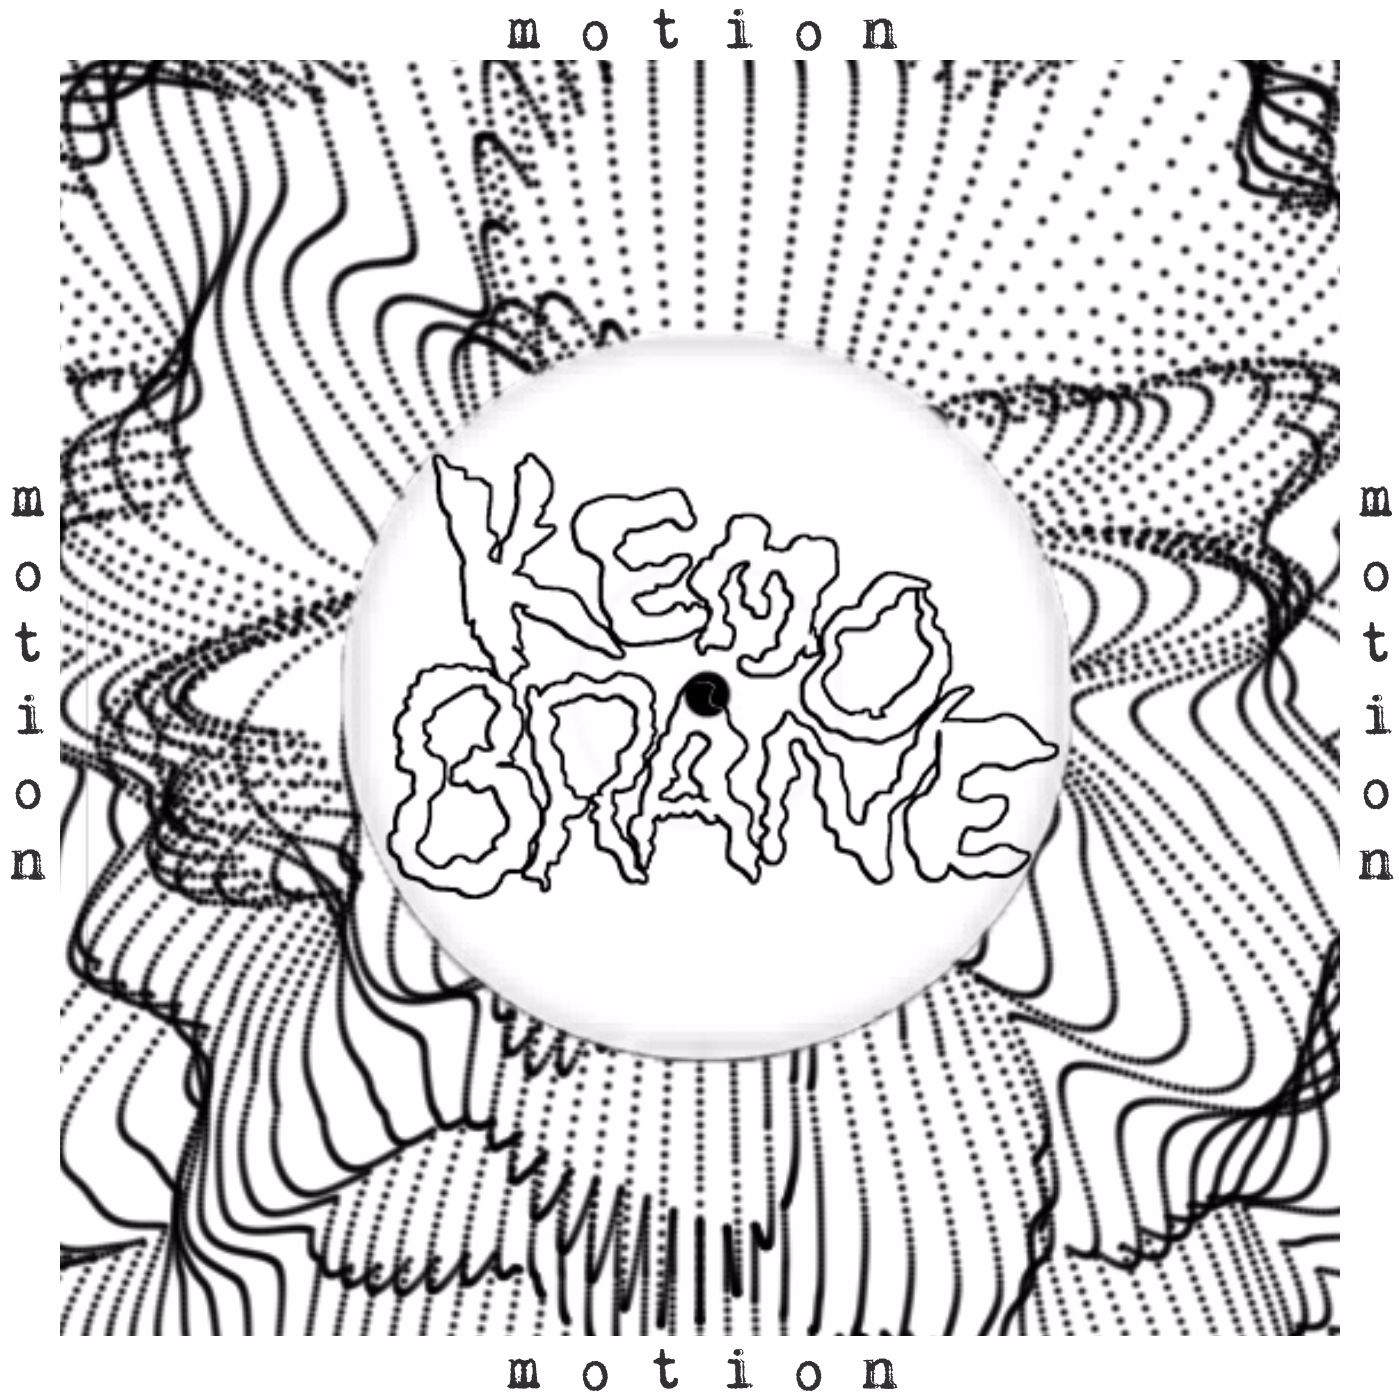 Kemo Brane